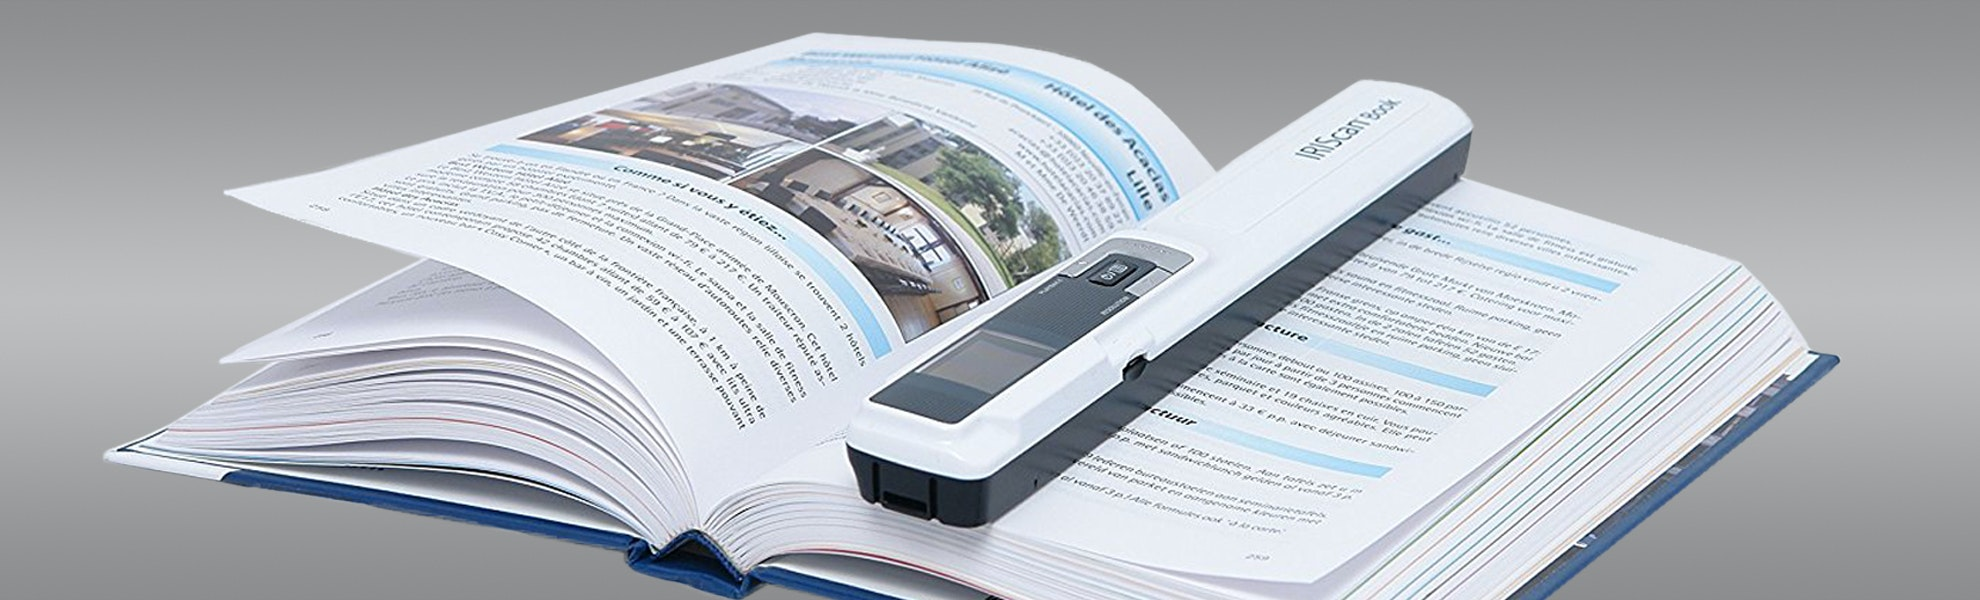 IRIS Scanners w/Readiris 15 Scanning Software